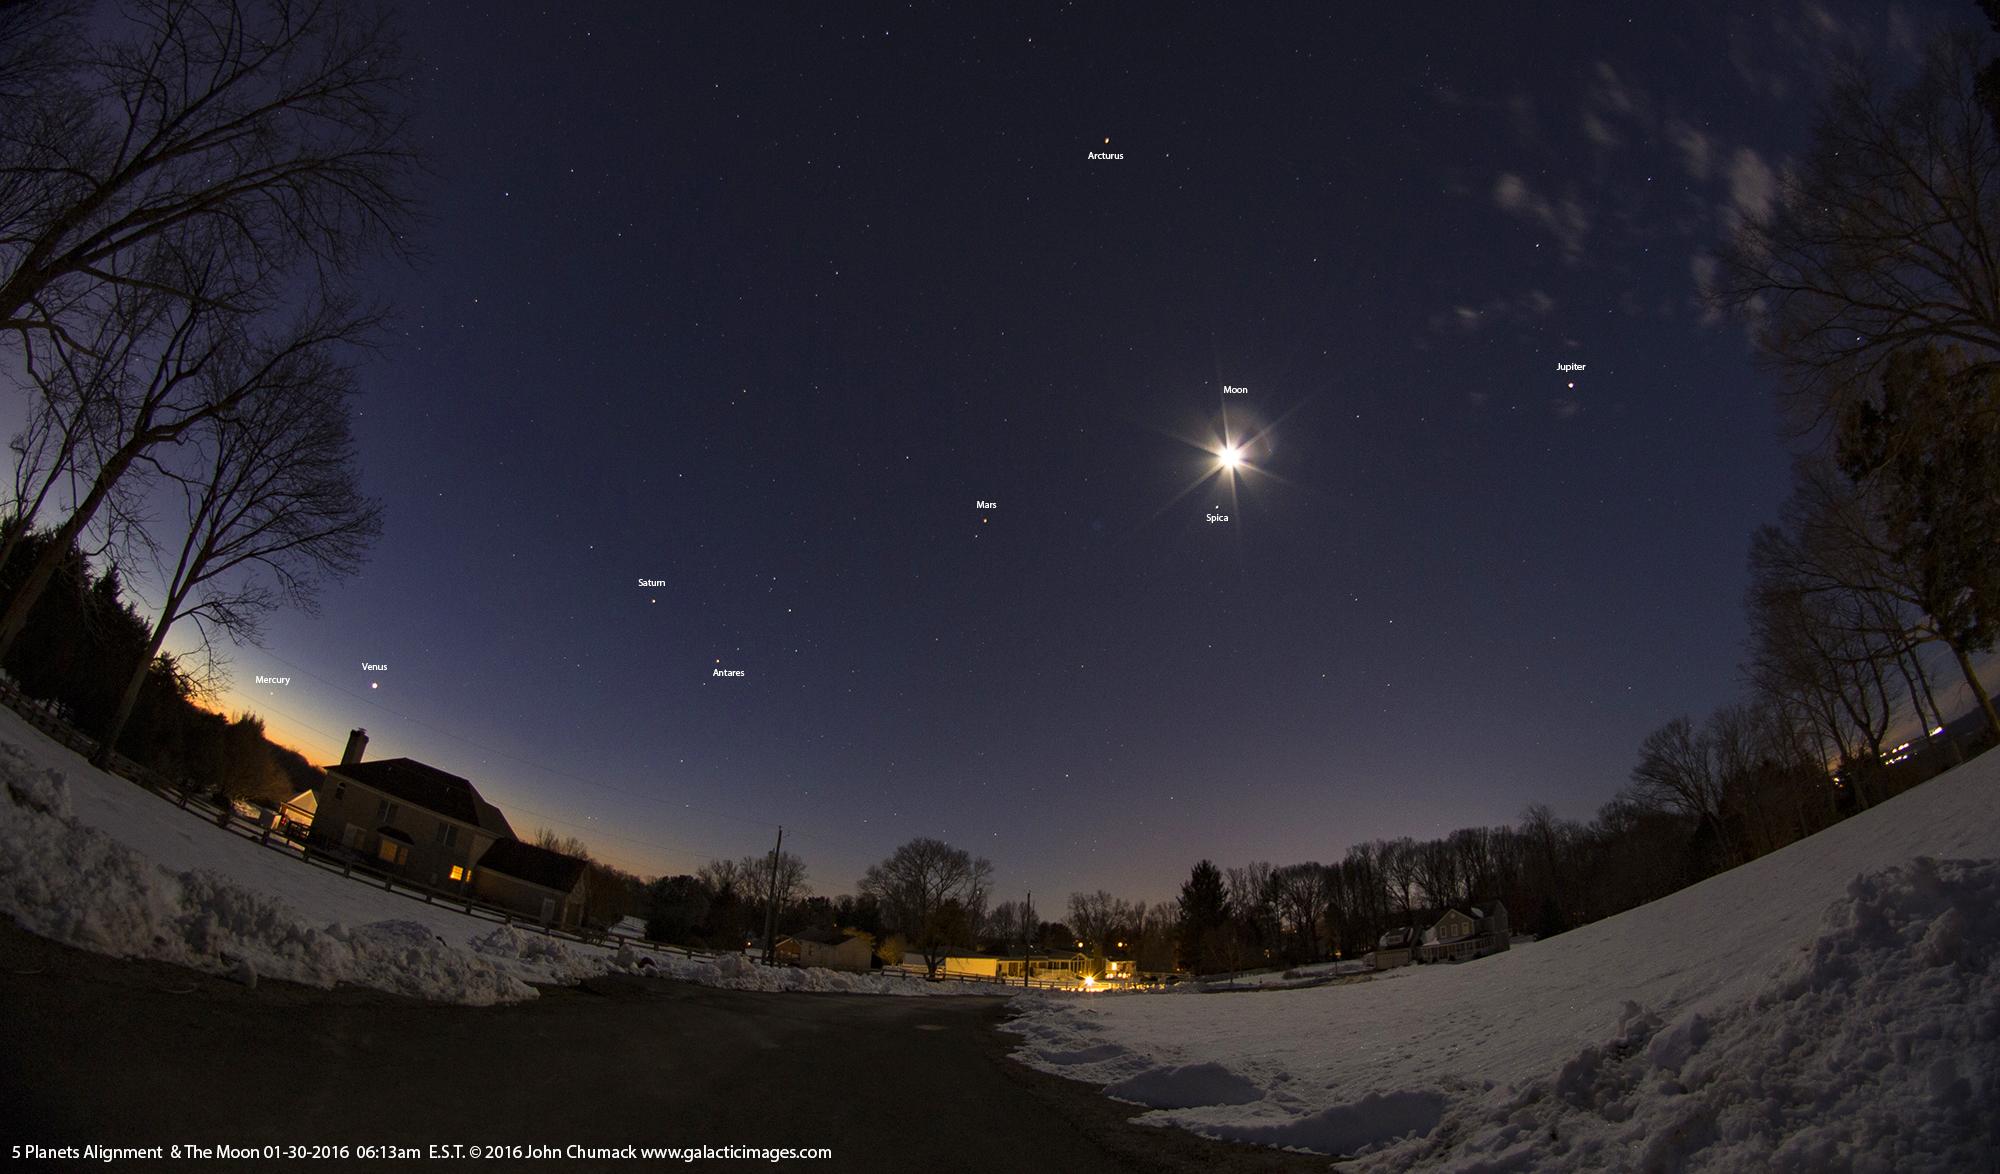 Alignment of Six Planets - EPOD - a service of USRA